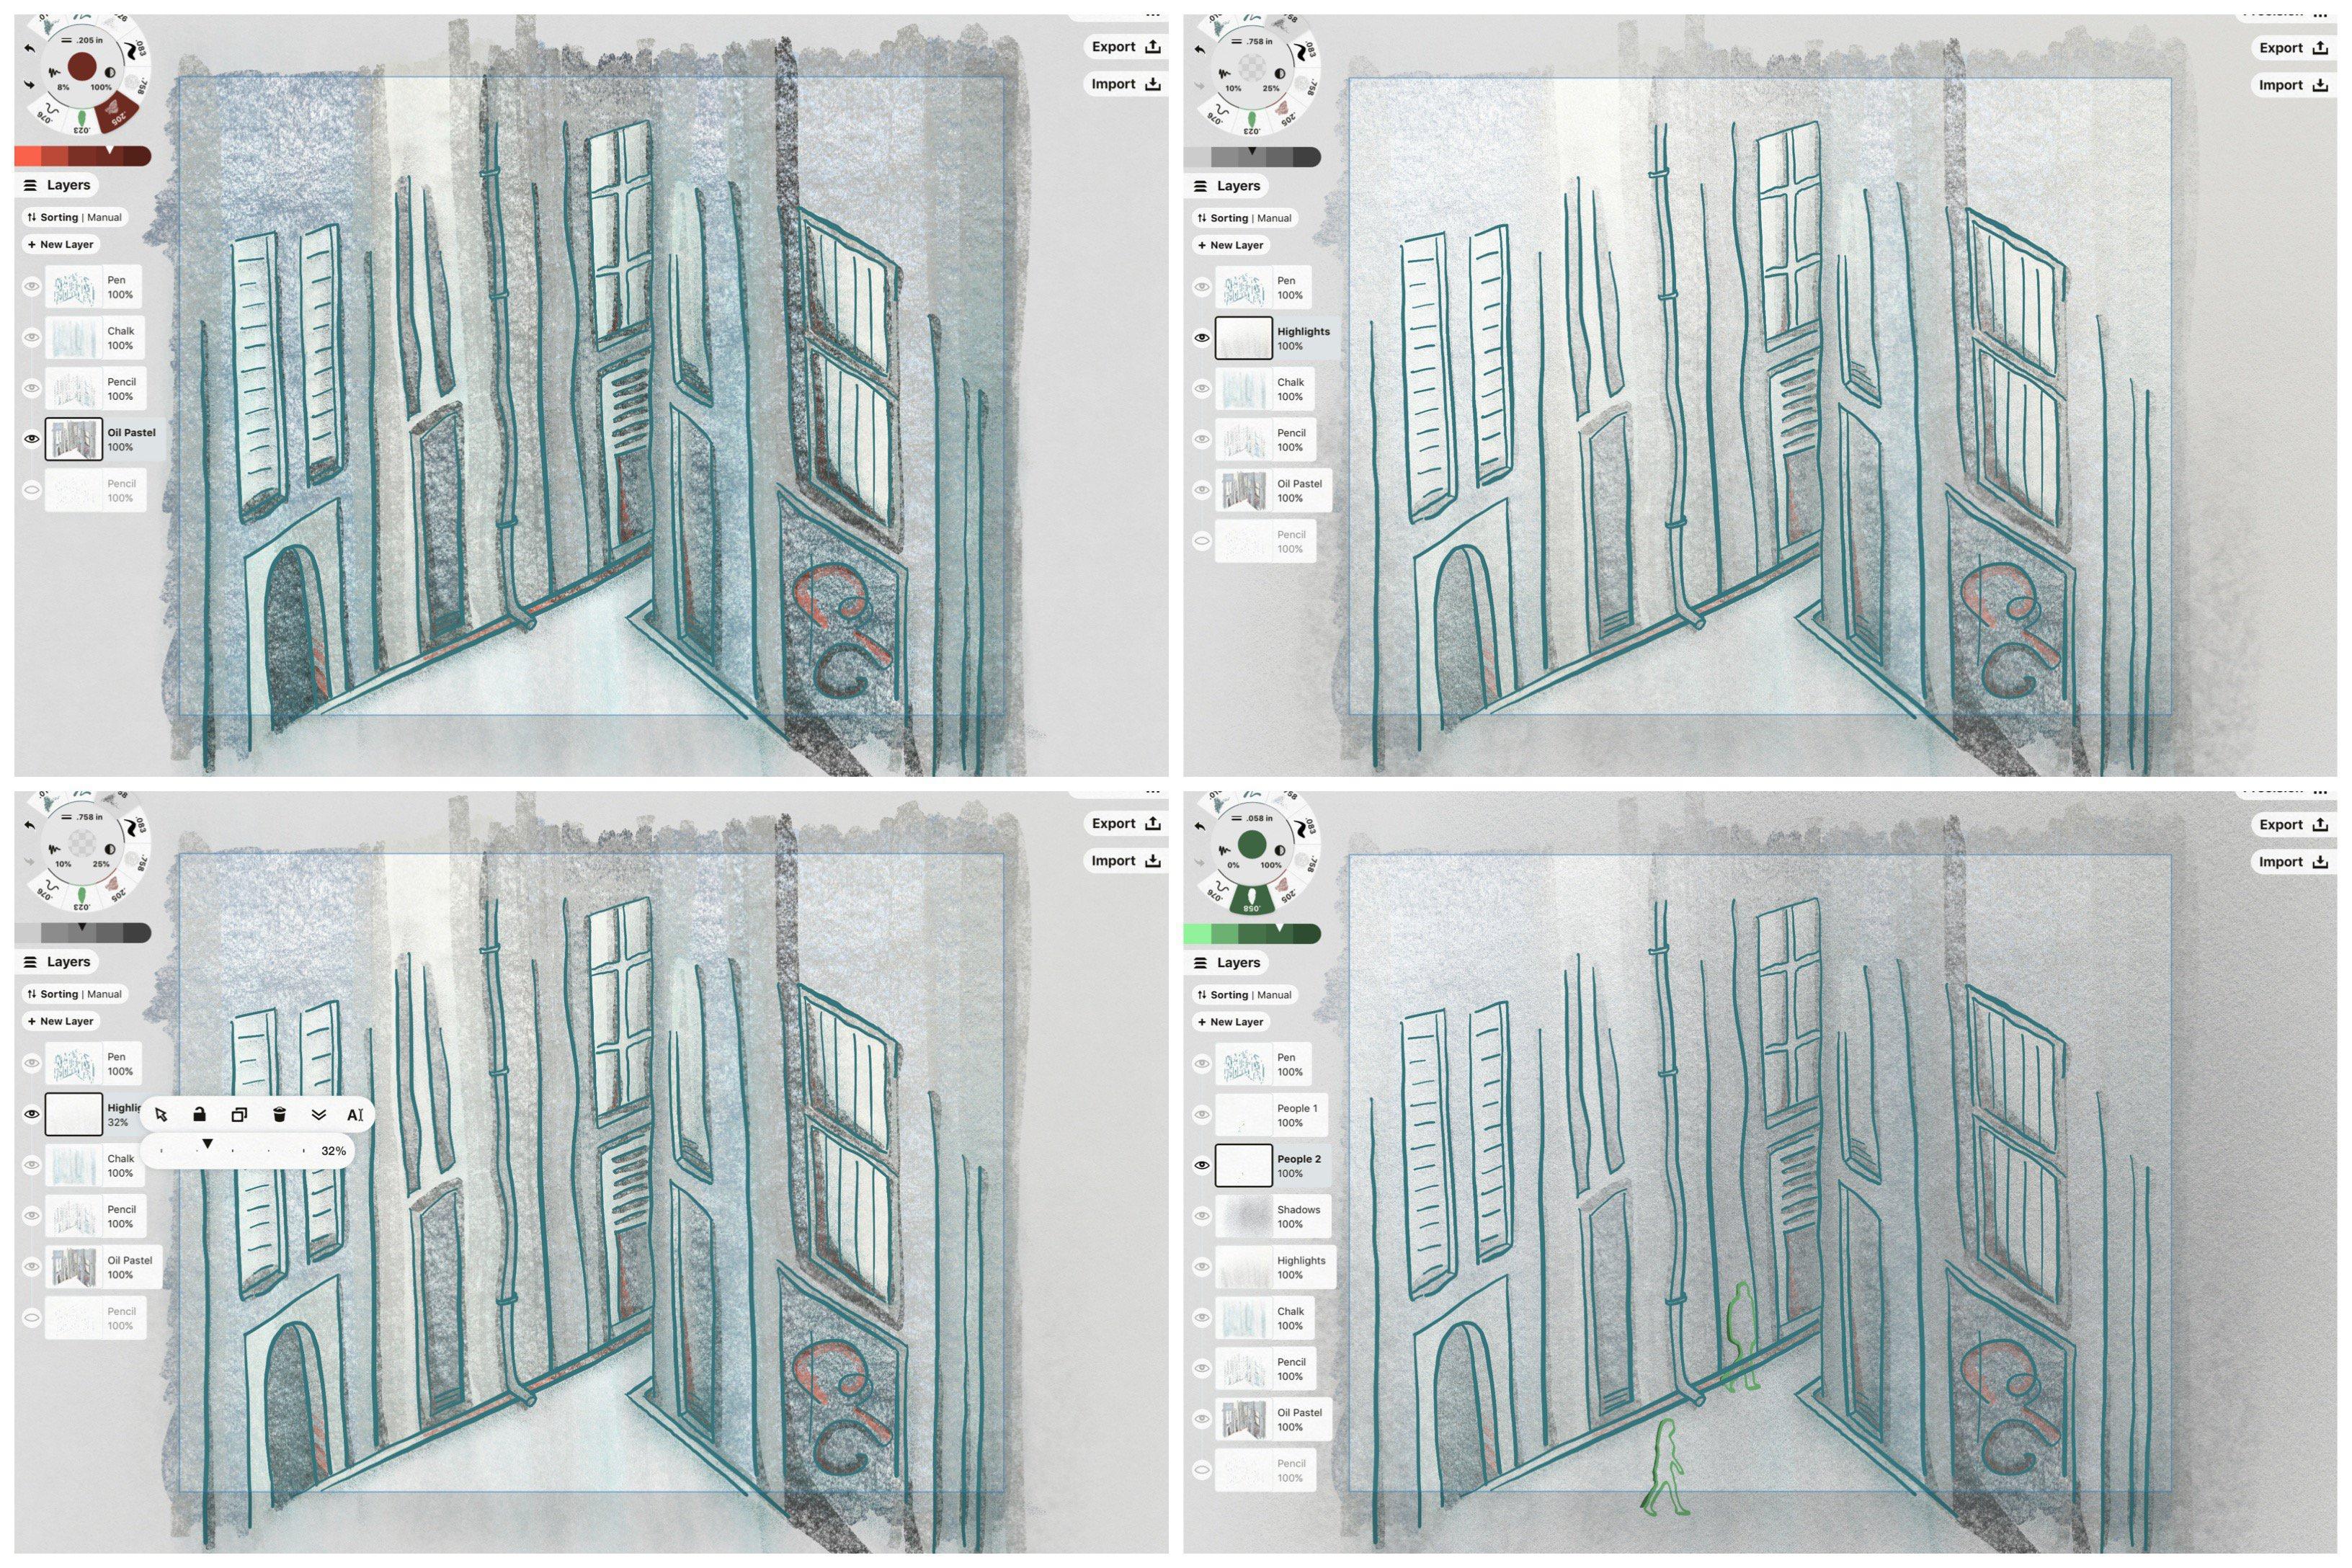 layers_illustration4.JPG